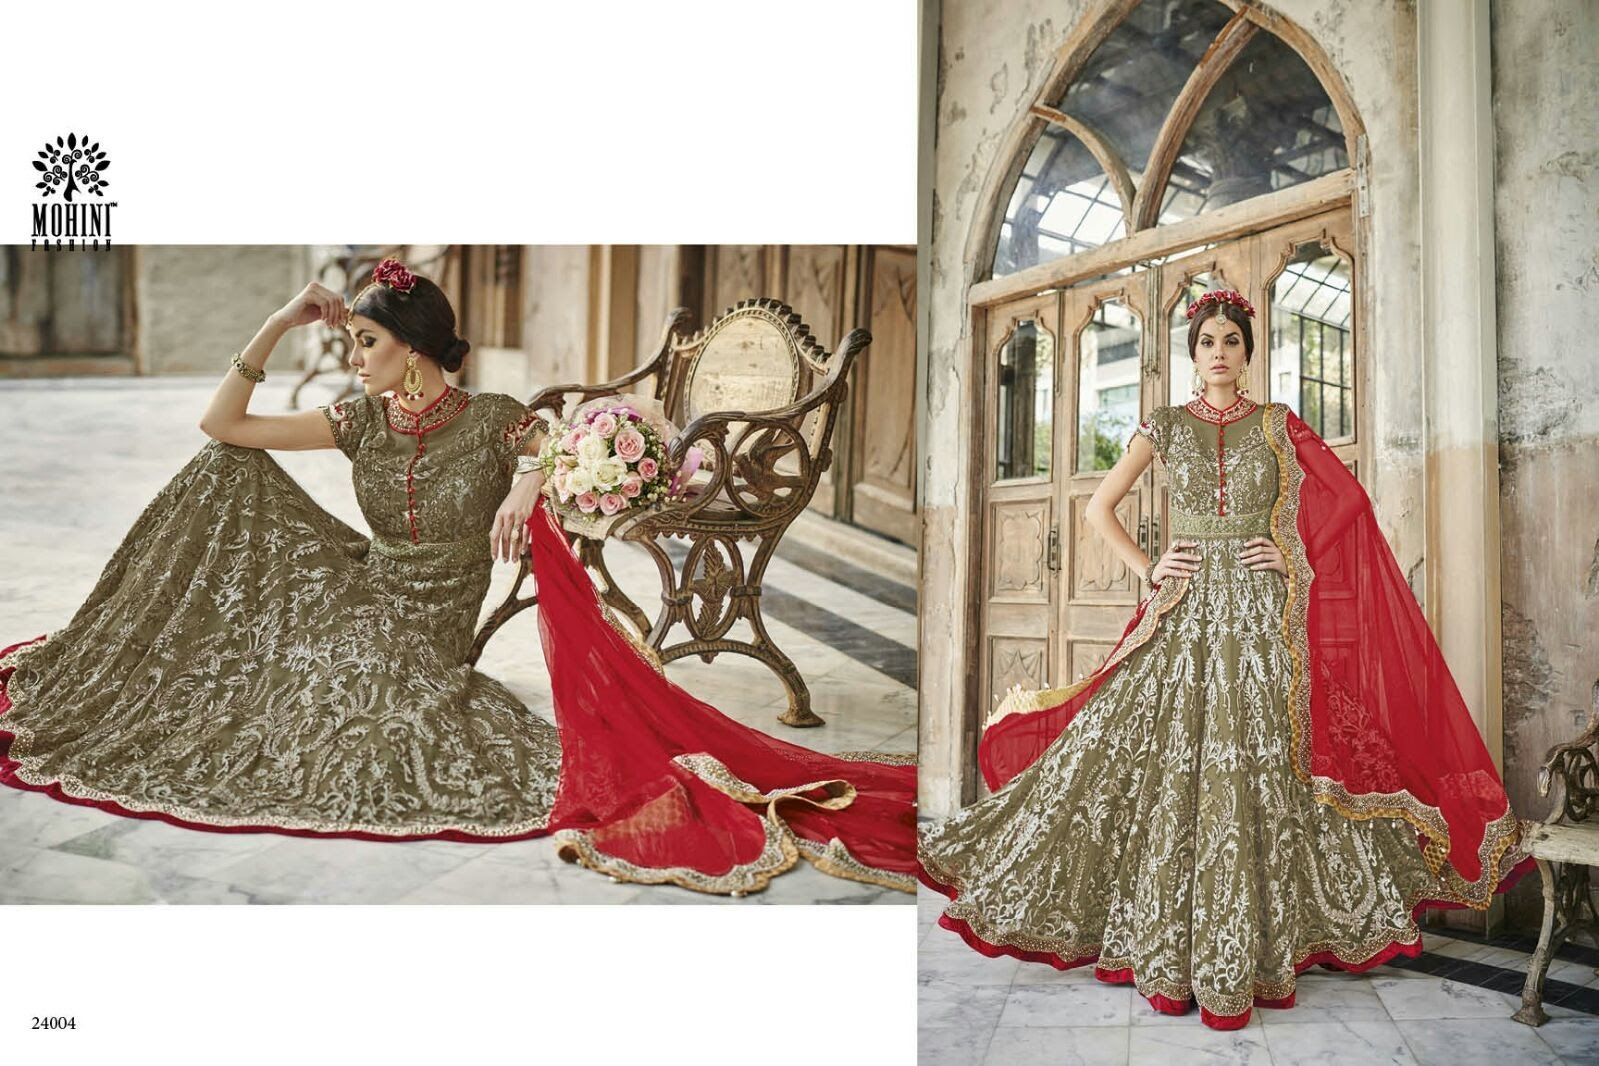 Buy Online Designer Lehenga's at New Shop.Get Coupon with free Shopping. Call/whatsapp +919876699111 Shop Now : goo.gl/ZaIQ7e